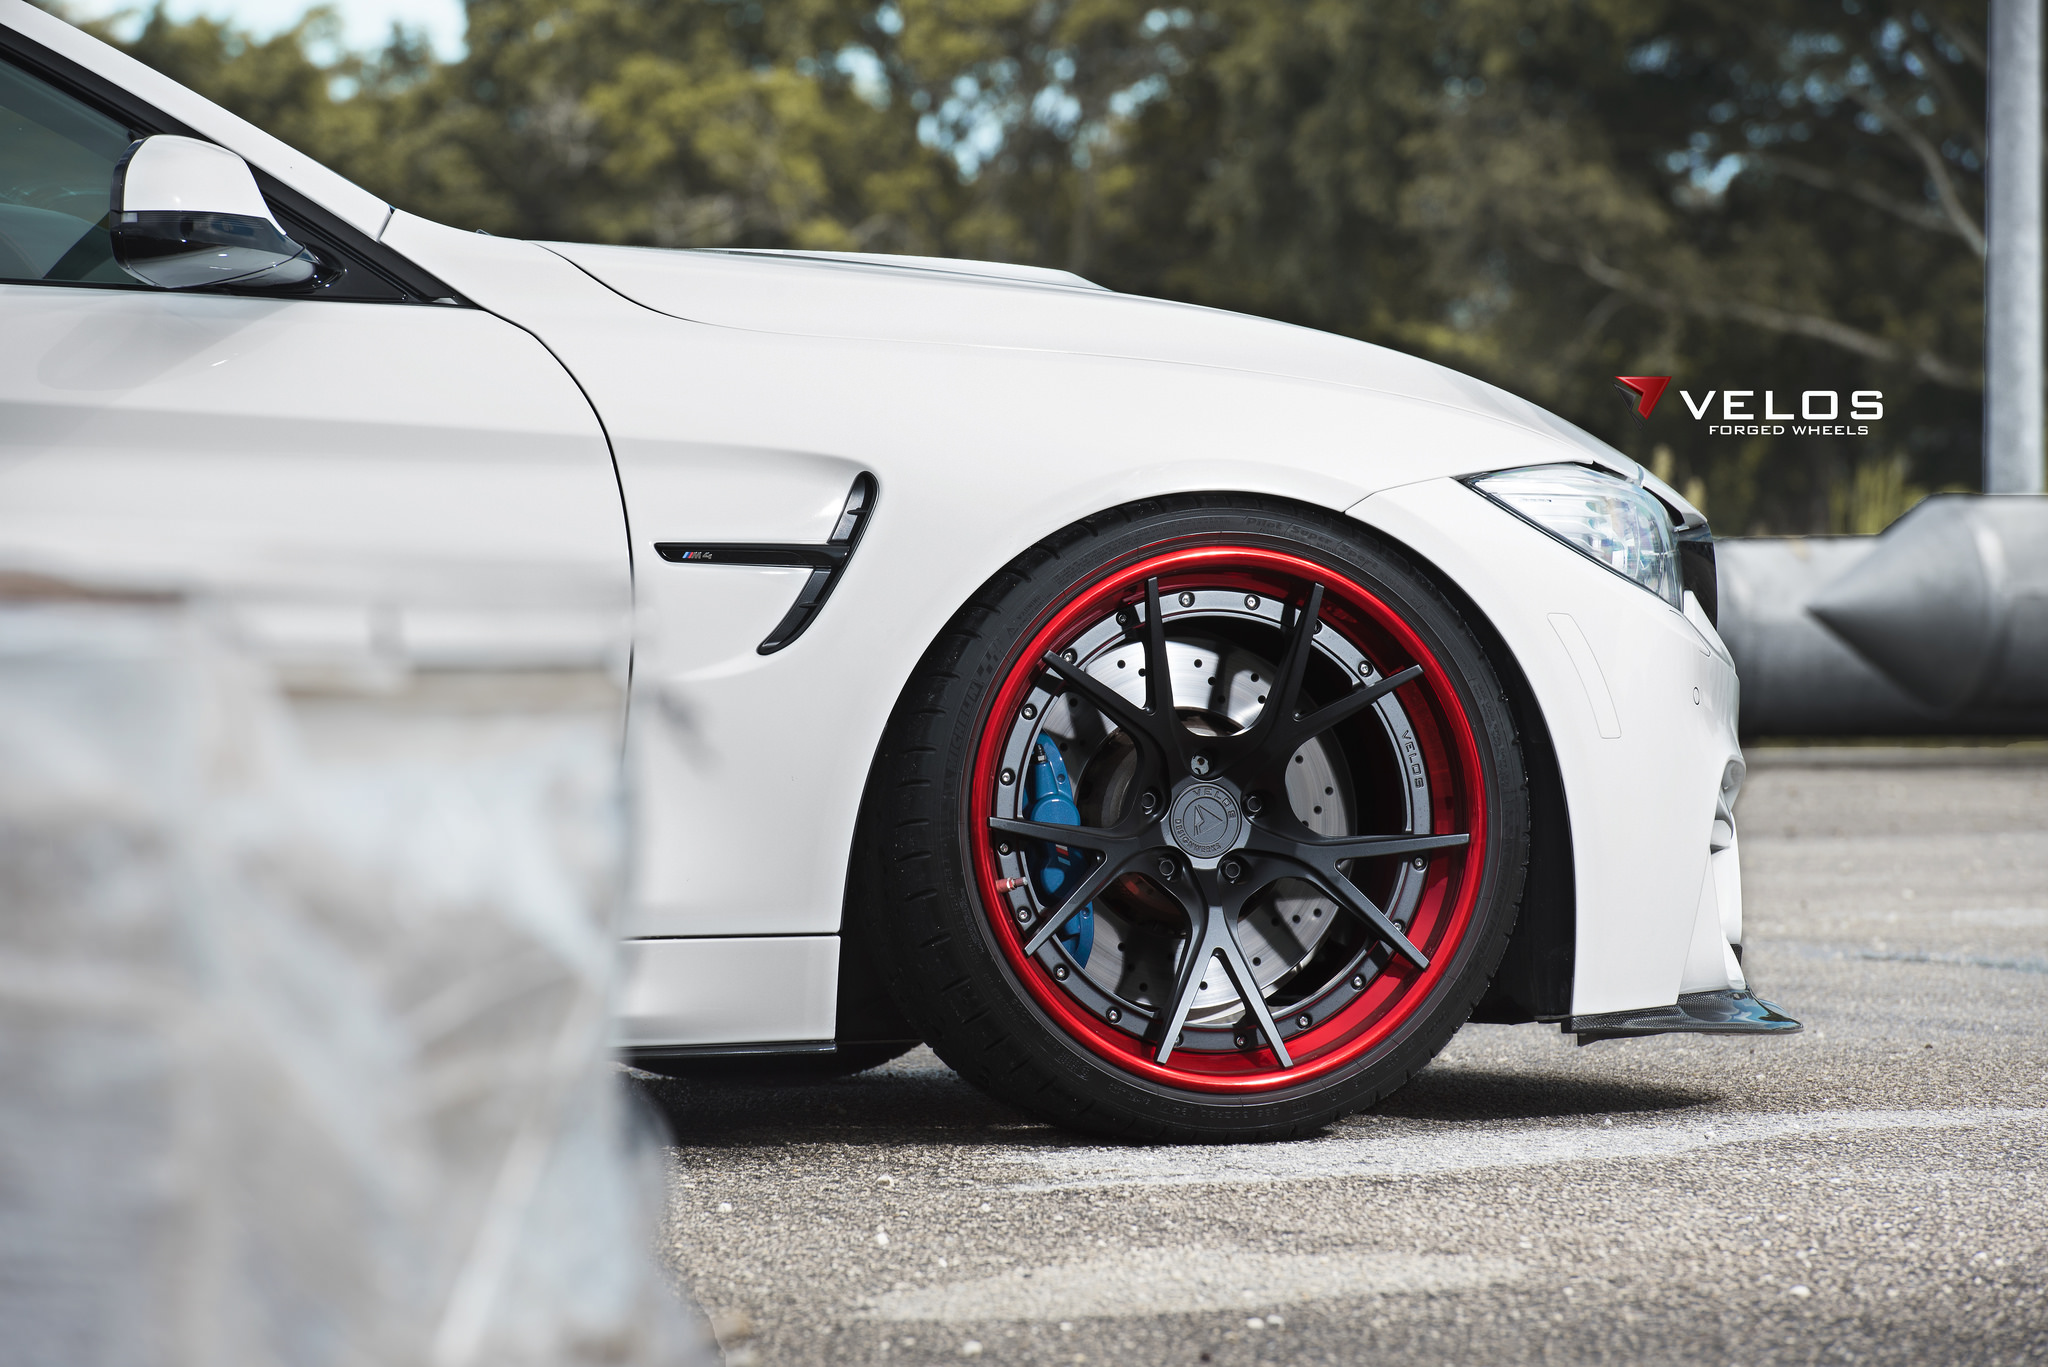 Nissan Gtr Car Hd Wallpapers Bmw F82 M4 On Velos S3 Forged Wheels Velos Designwerks